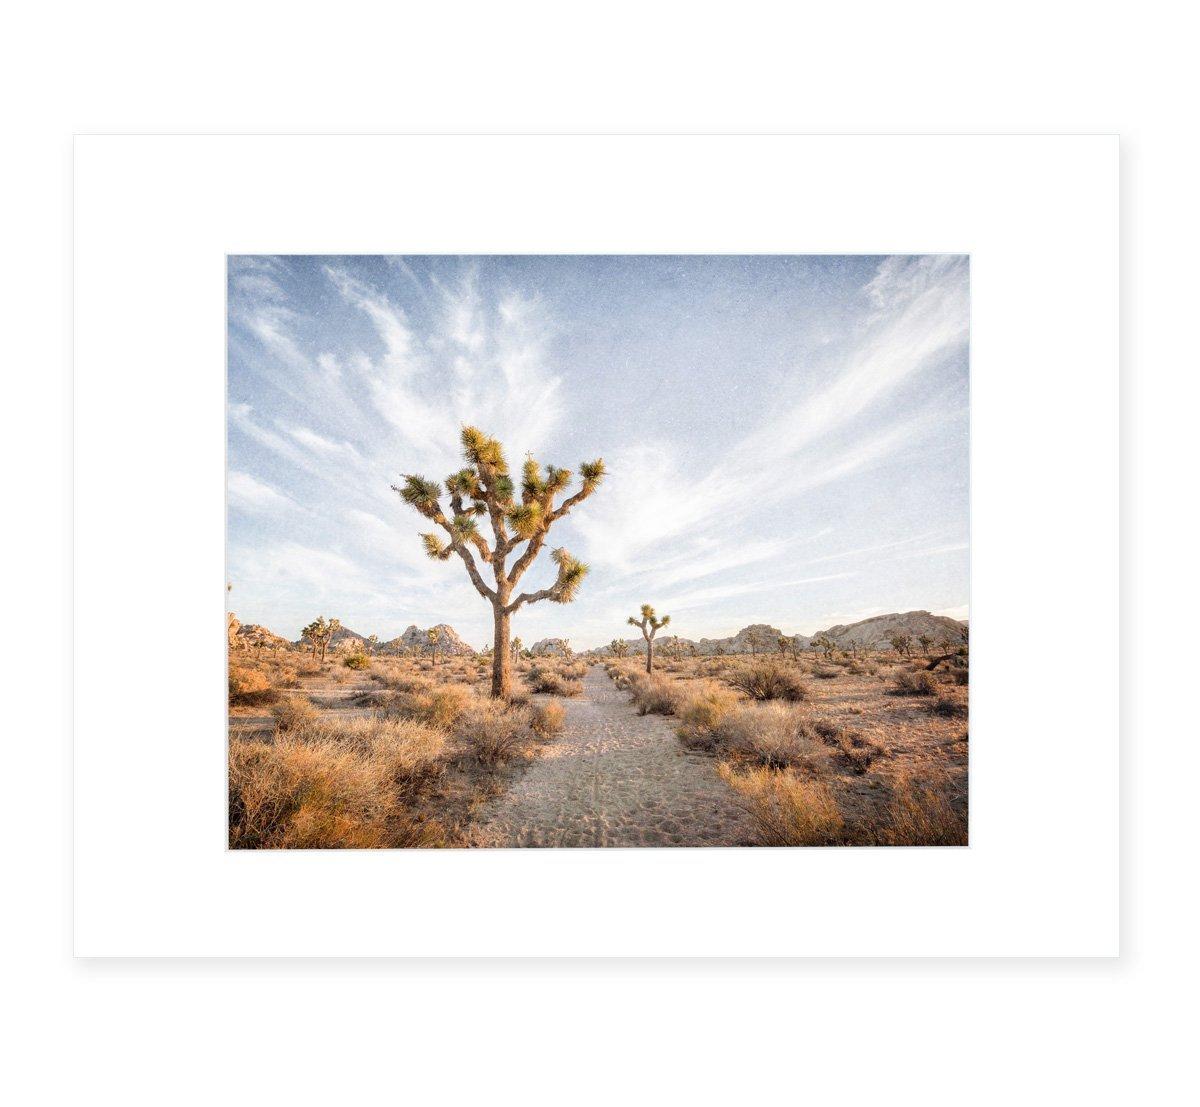 Southwest Wall Art, Joshua Tree Photography, California Desert Decor, Palm Springs Landscape Art, 8x10 Matted Photographic Print (fits 11x14 frame), 'Path to Joshua' 'Path to Joshua'